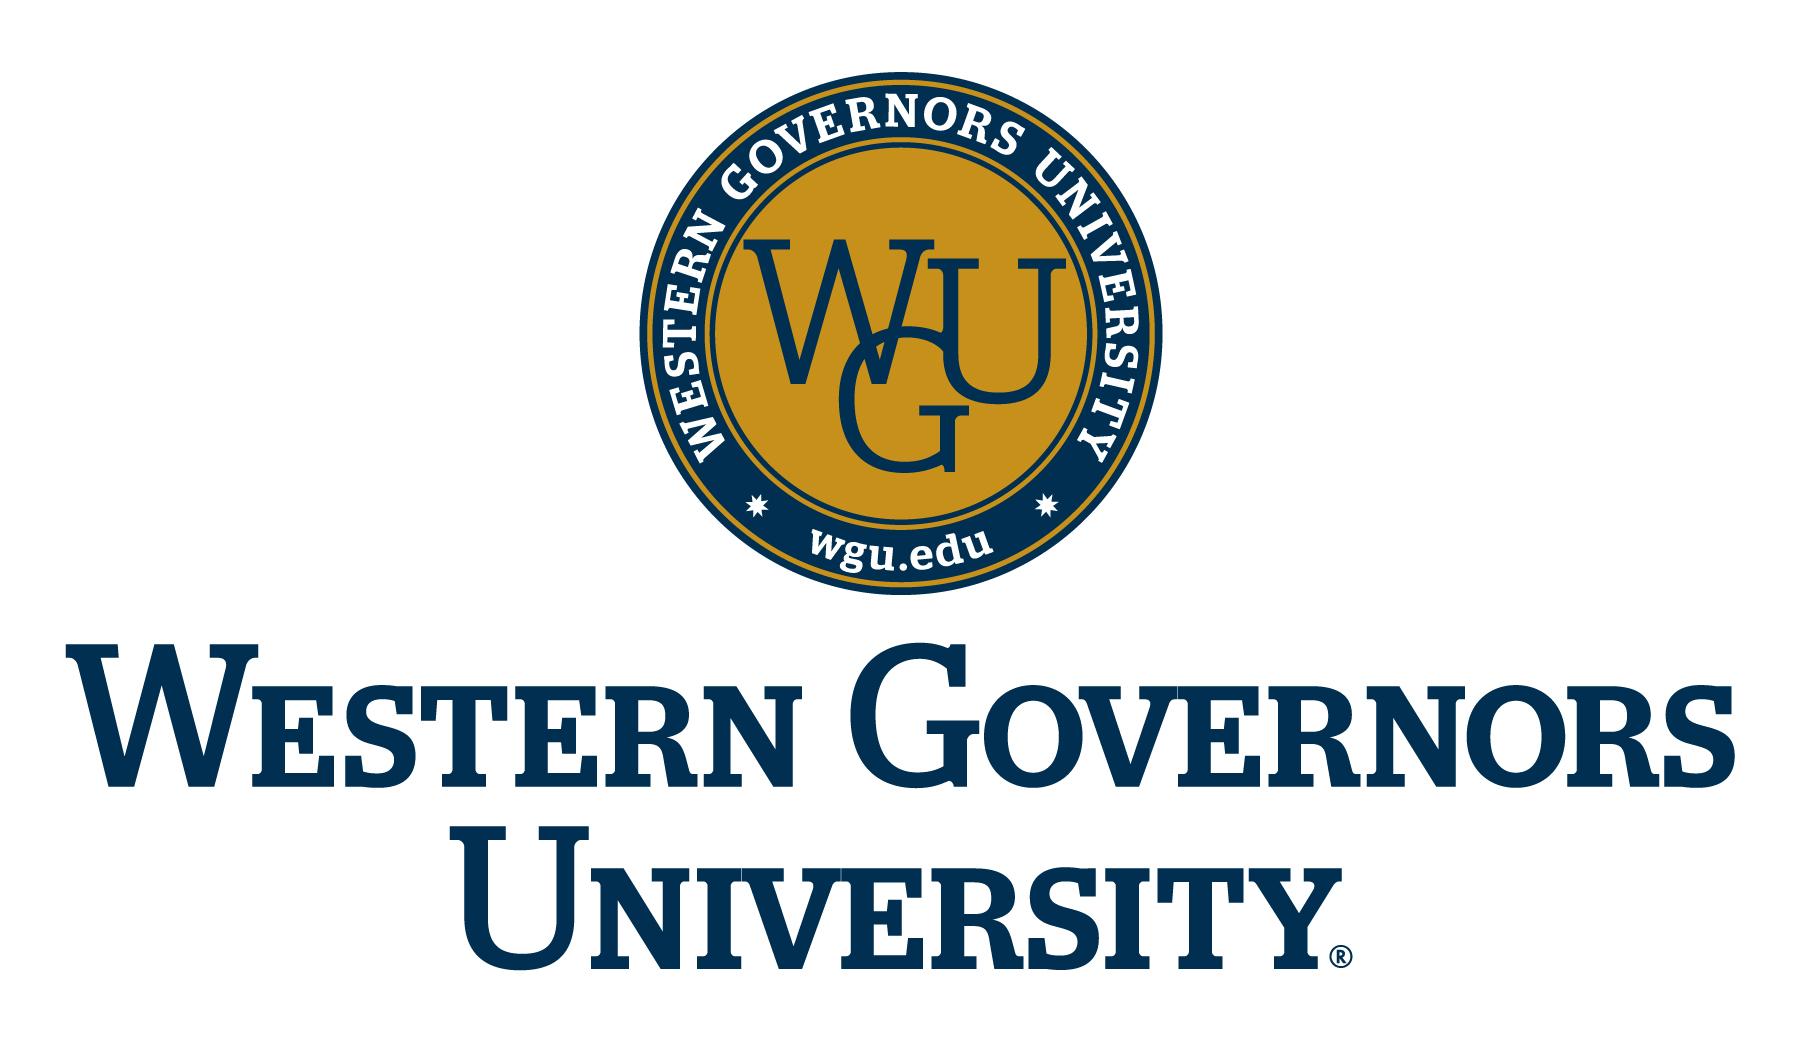 WGU online business administration degree - collegecliffs.com